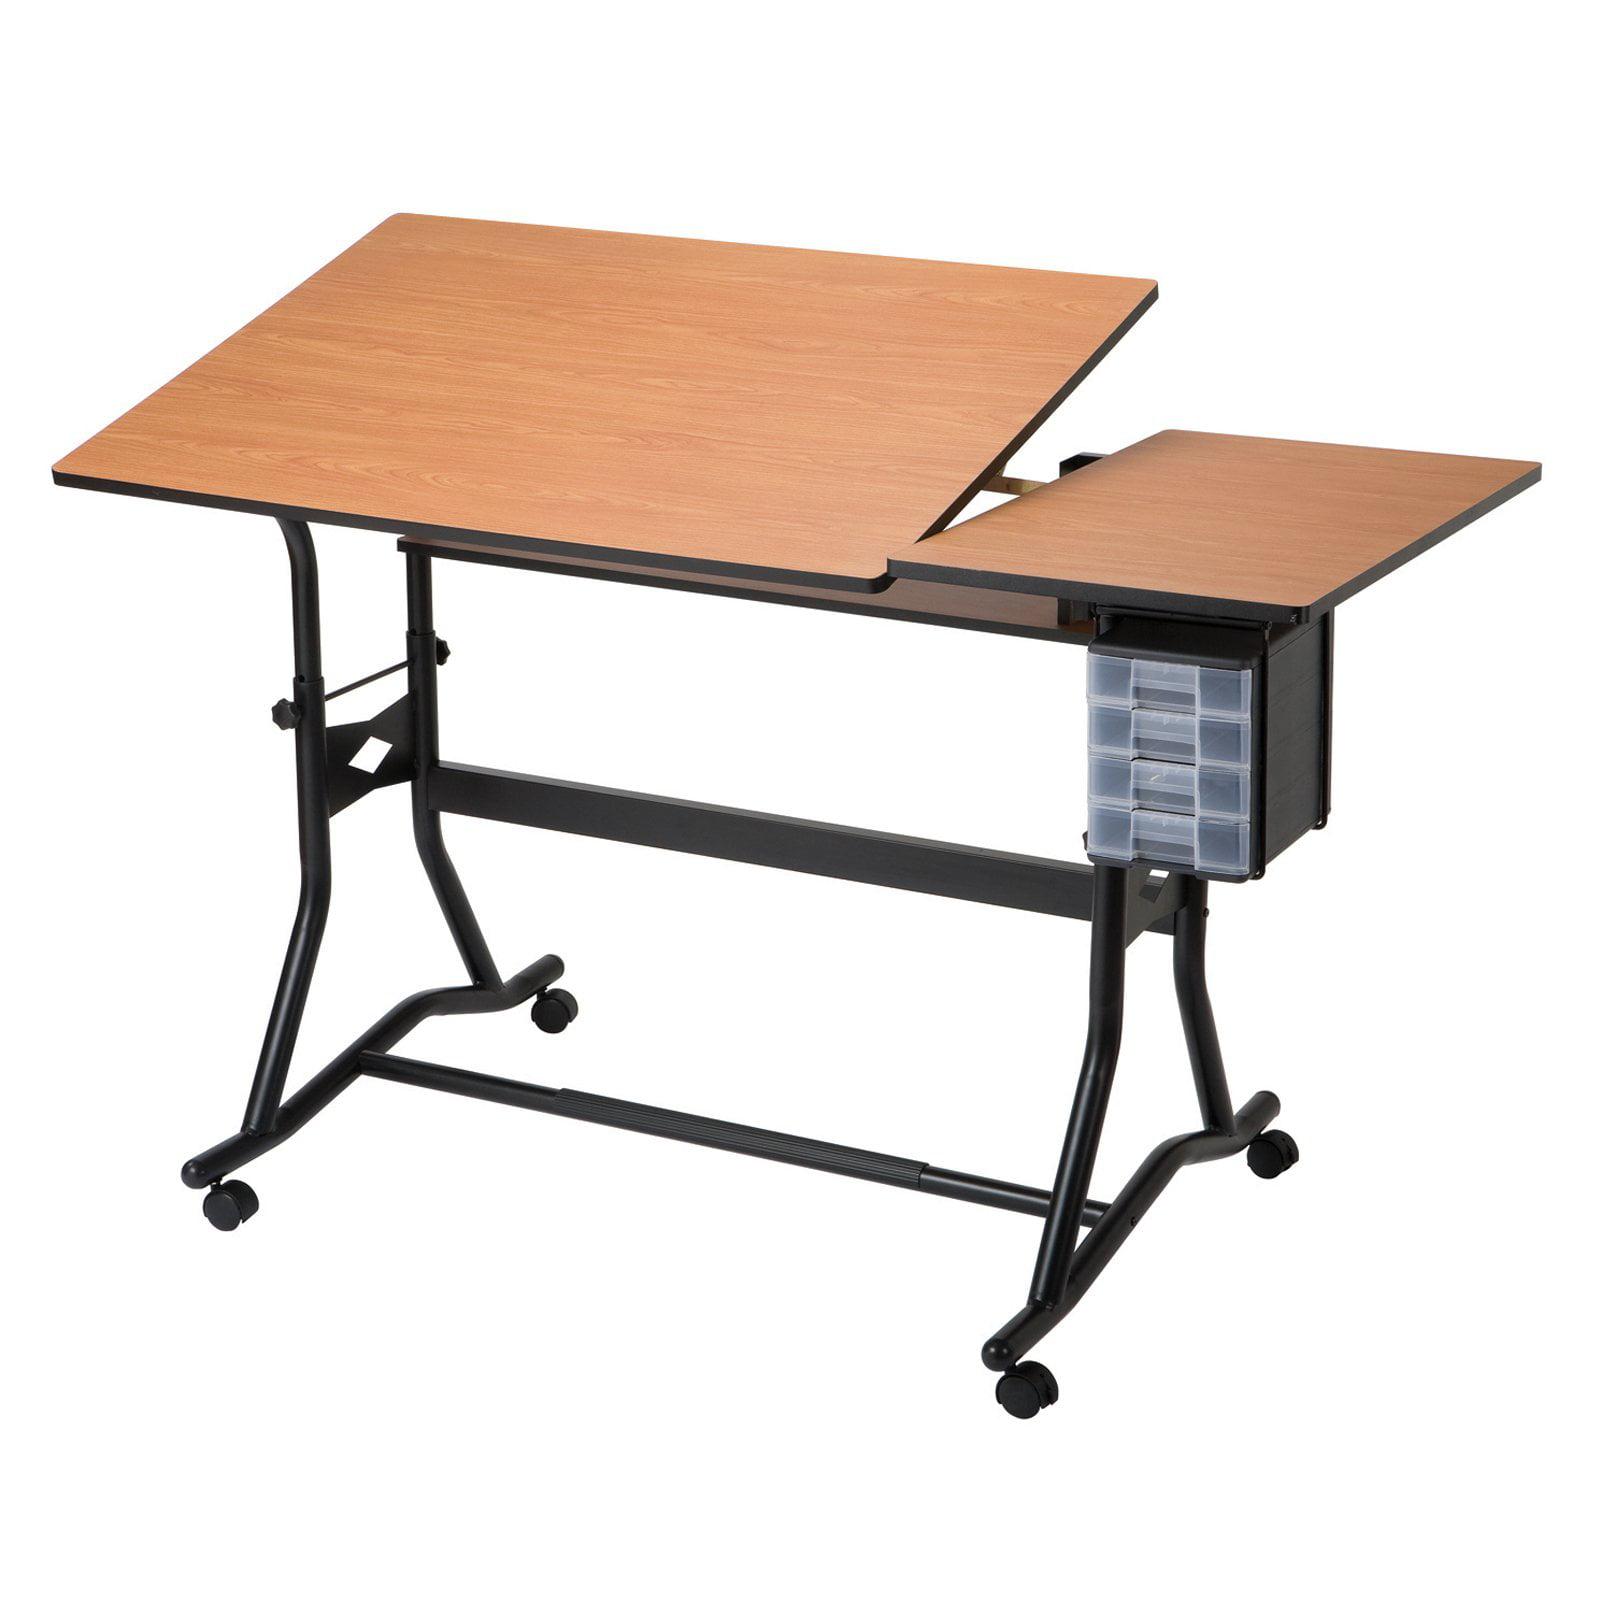 Alvin CraftMaster III Split Top Drafting Table Walmartcom - Electric drafting table